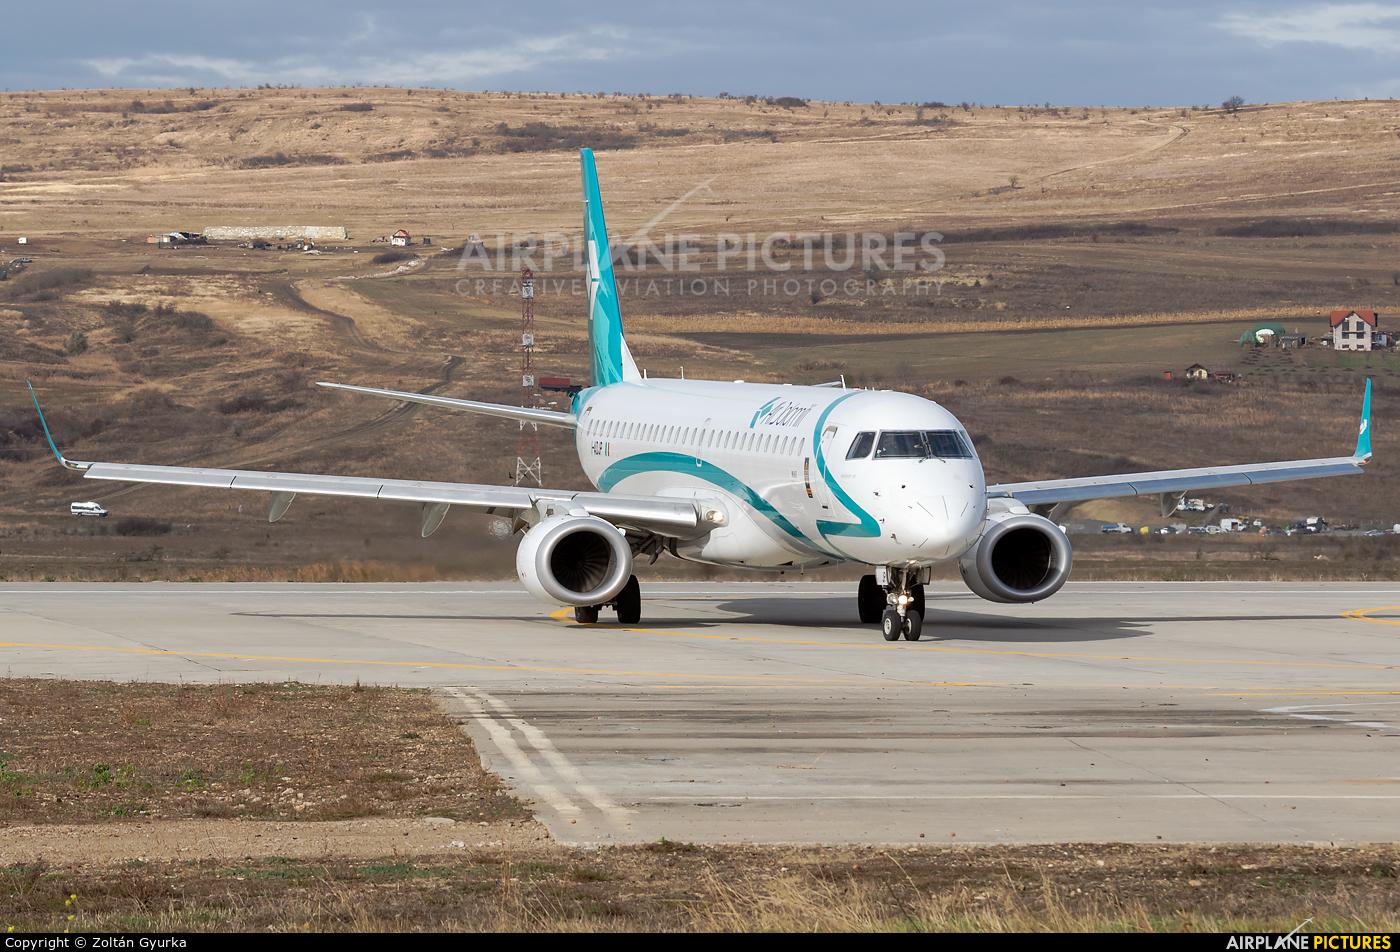 Air Dolomiti I-ADJP aircraft at Cluj Napoca - Someseni